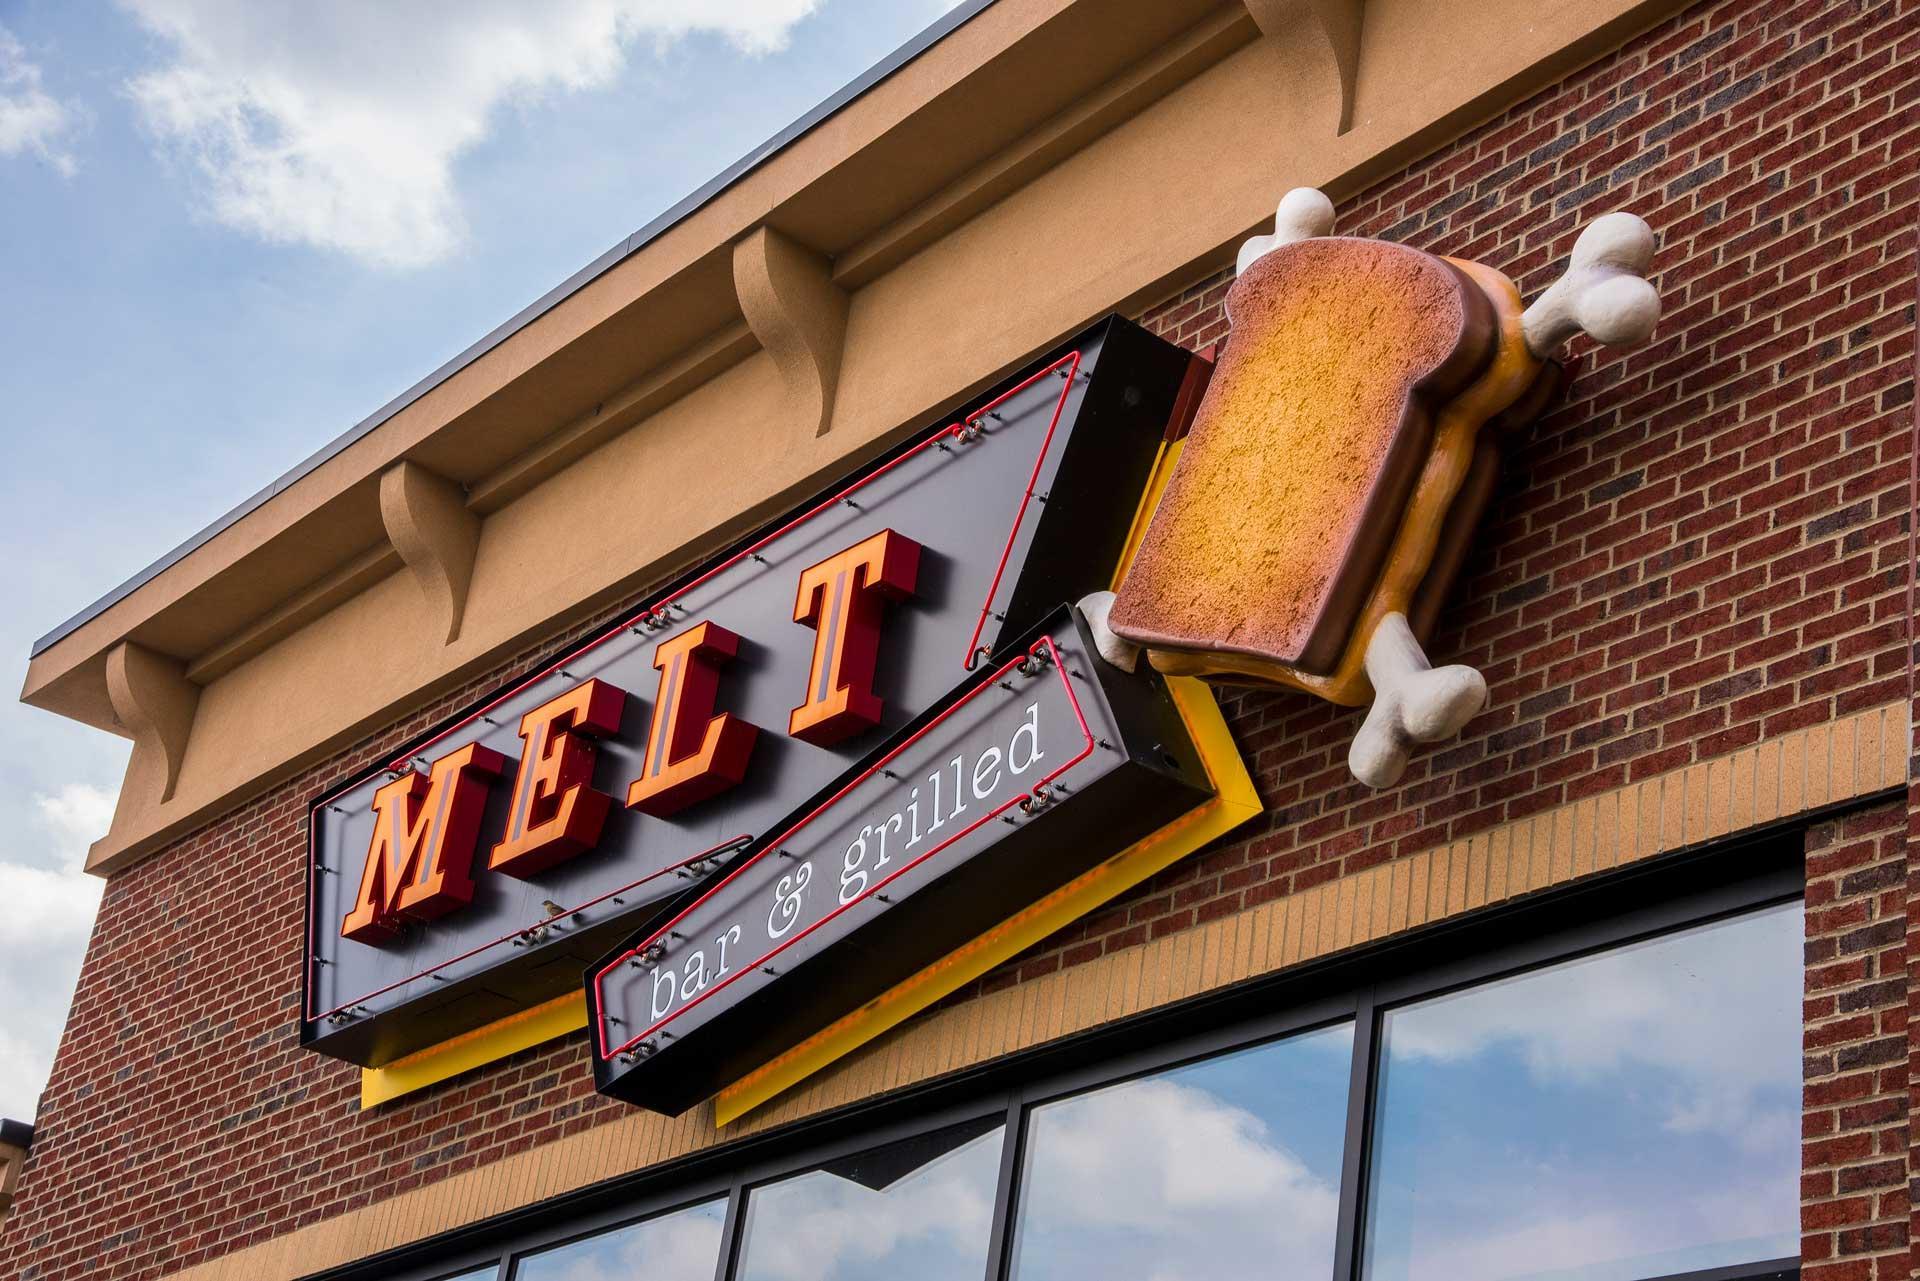 Melt Bar and Grilled image 21